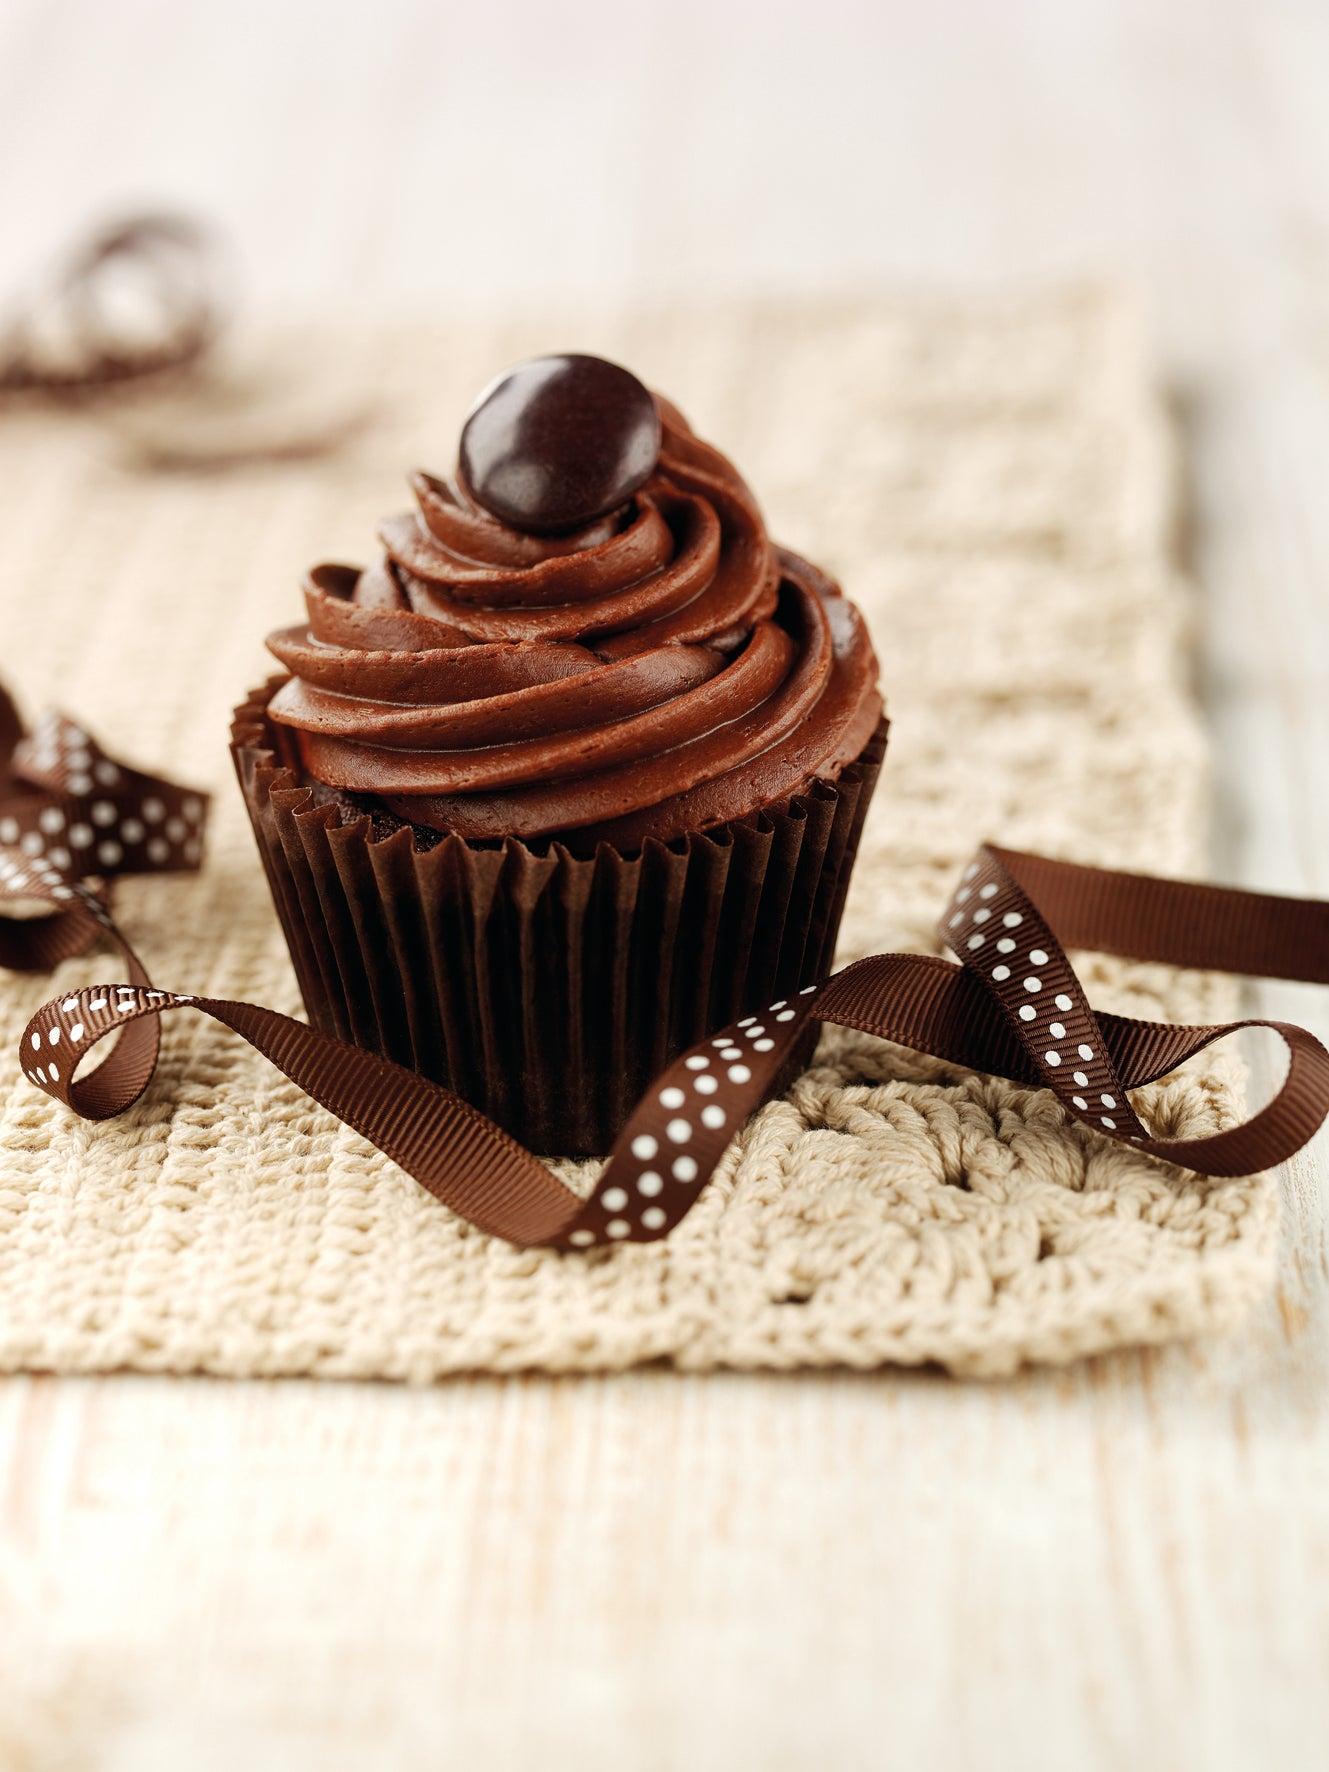 Nielsen-Massey-Chocolate-Cupcake.jpg